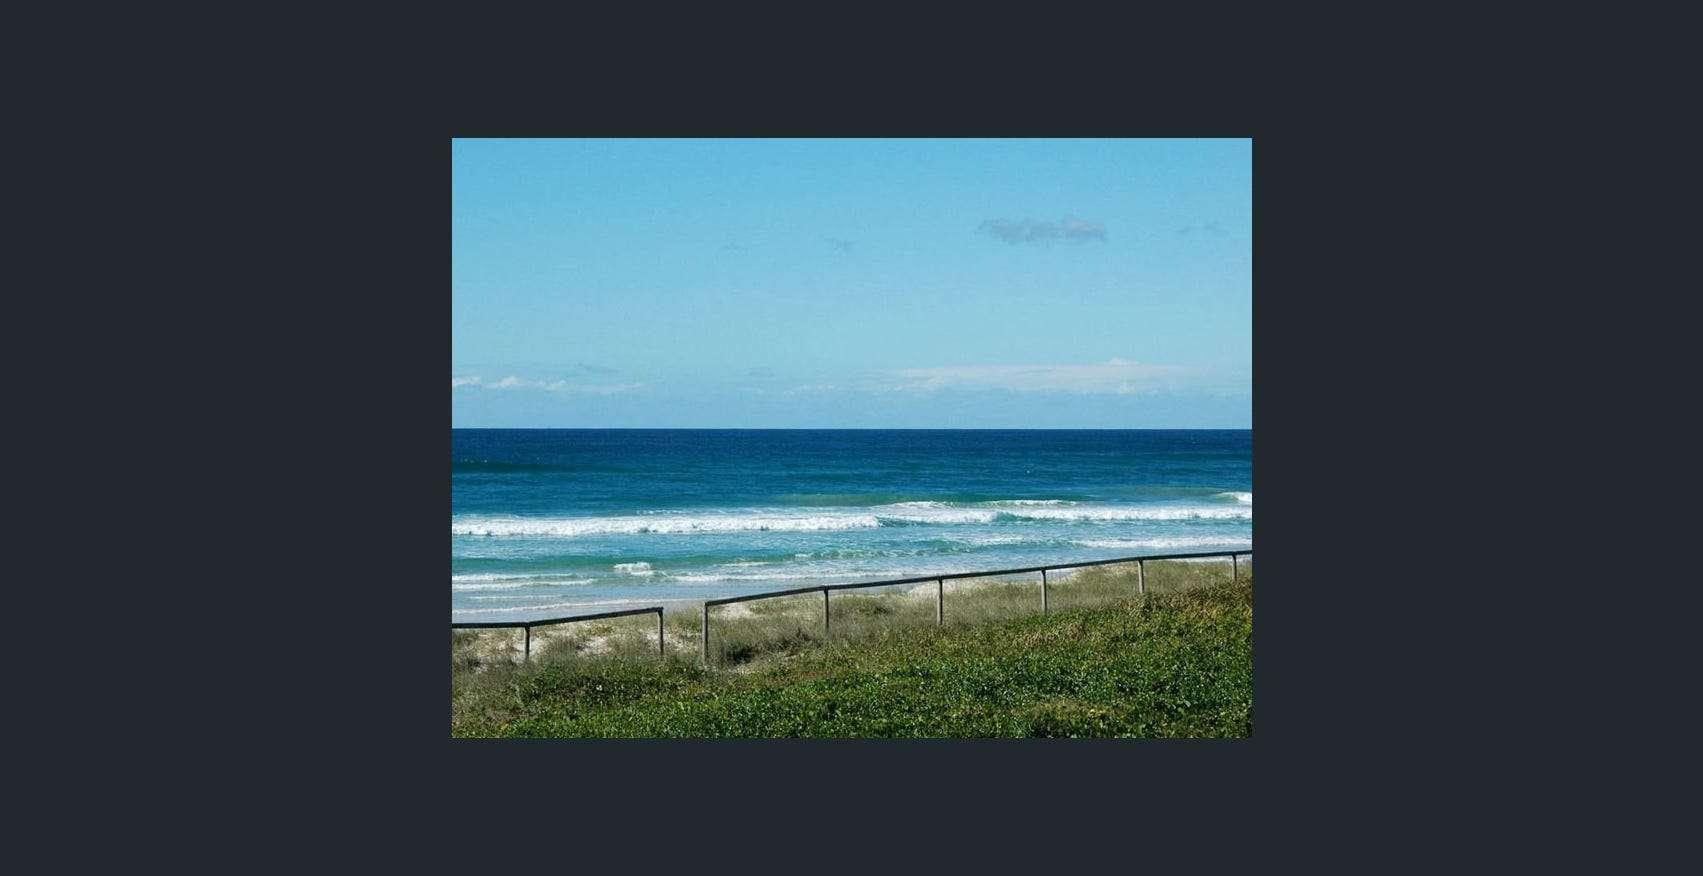 1/26 Francis Street, Mermaid Beach, QLD 4218